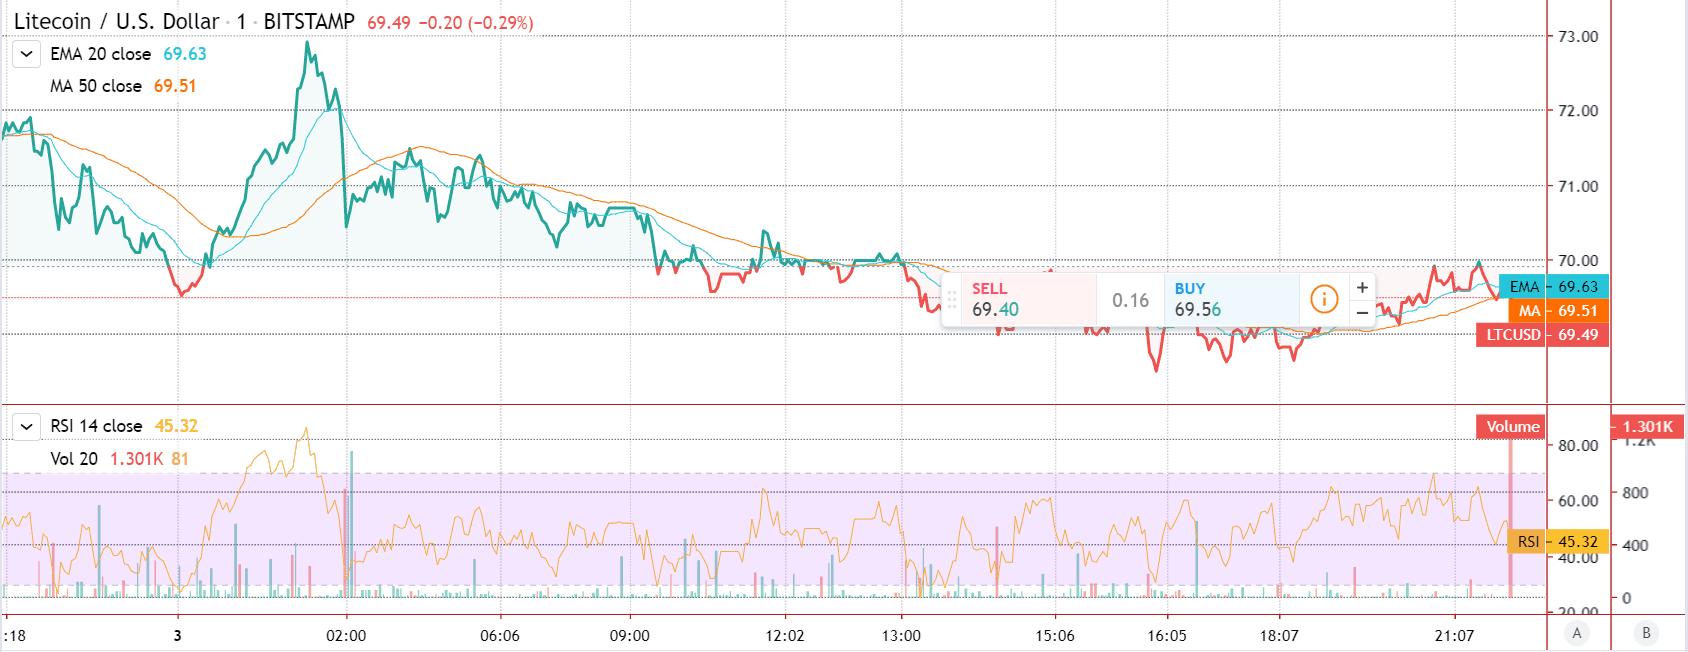 Litecoin Featured Price Chart